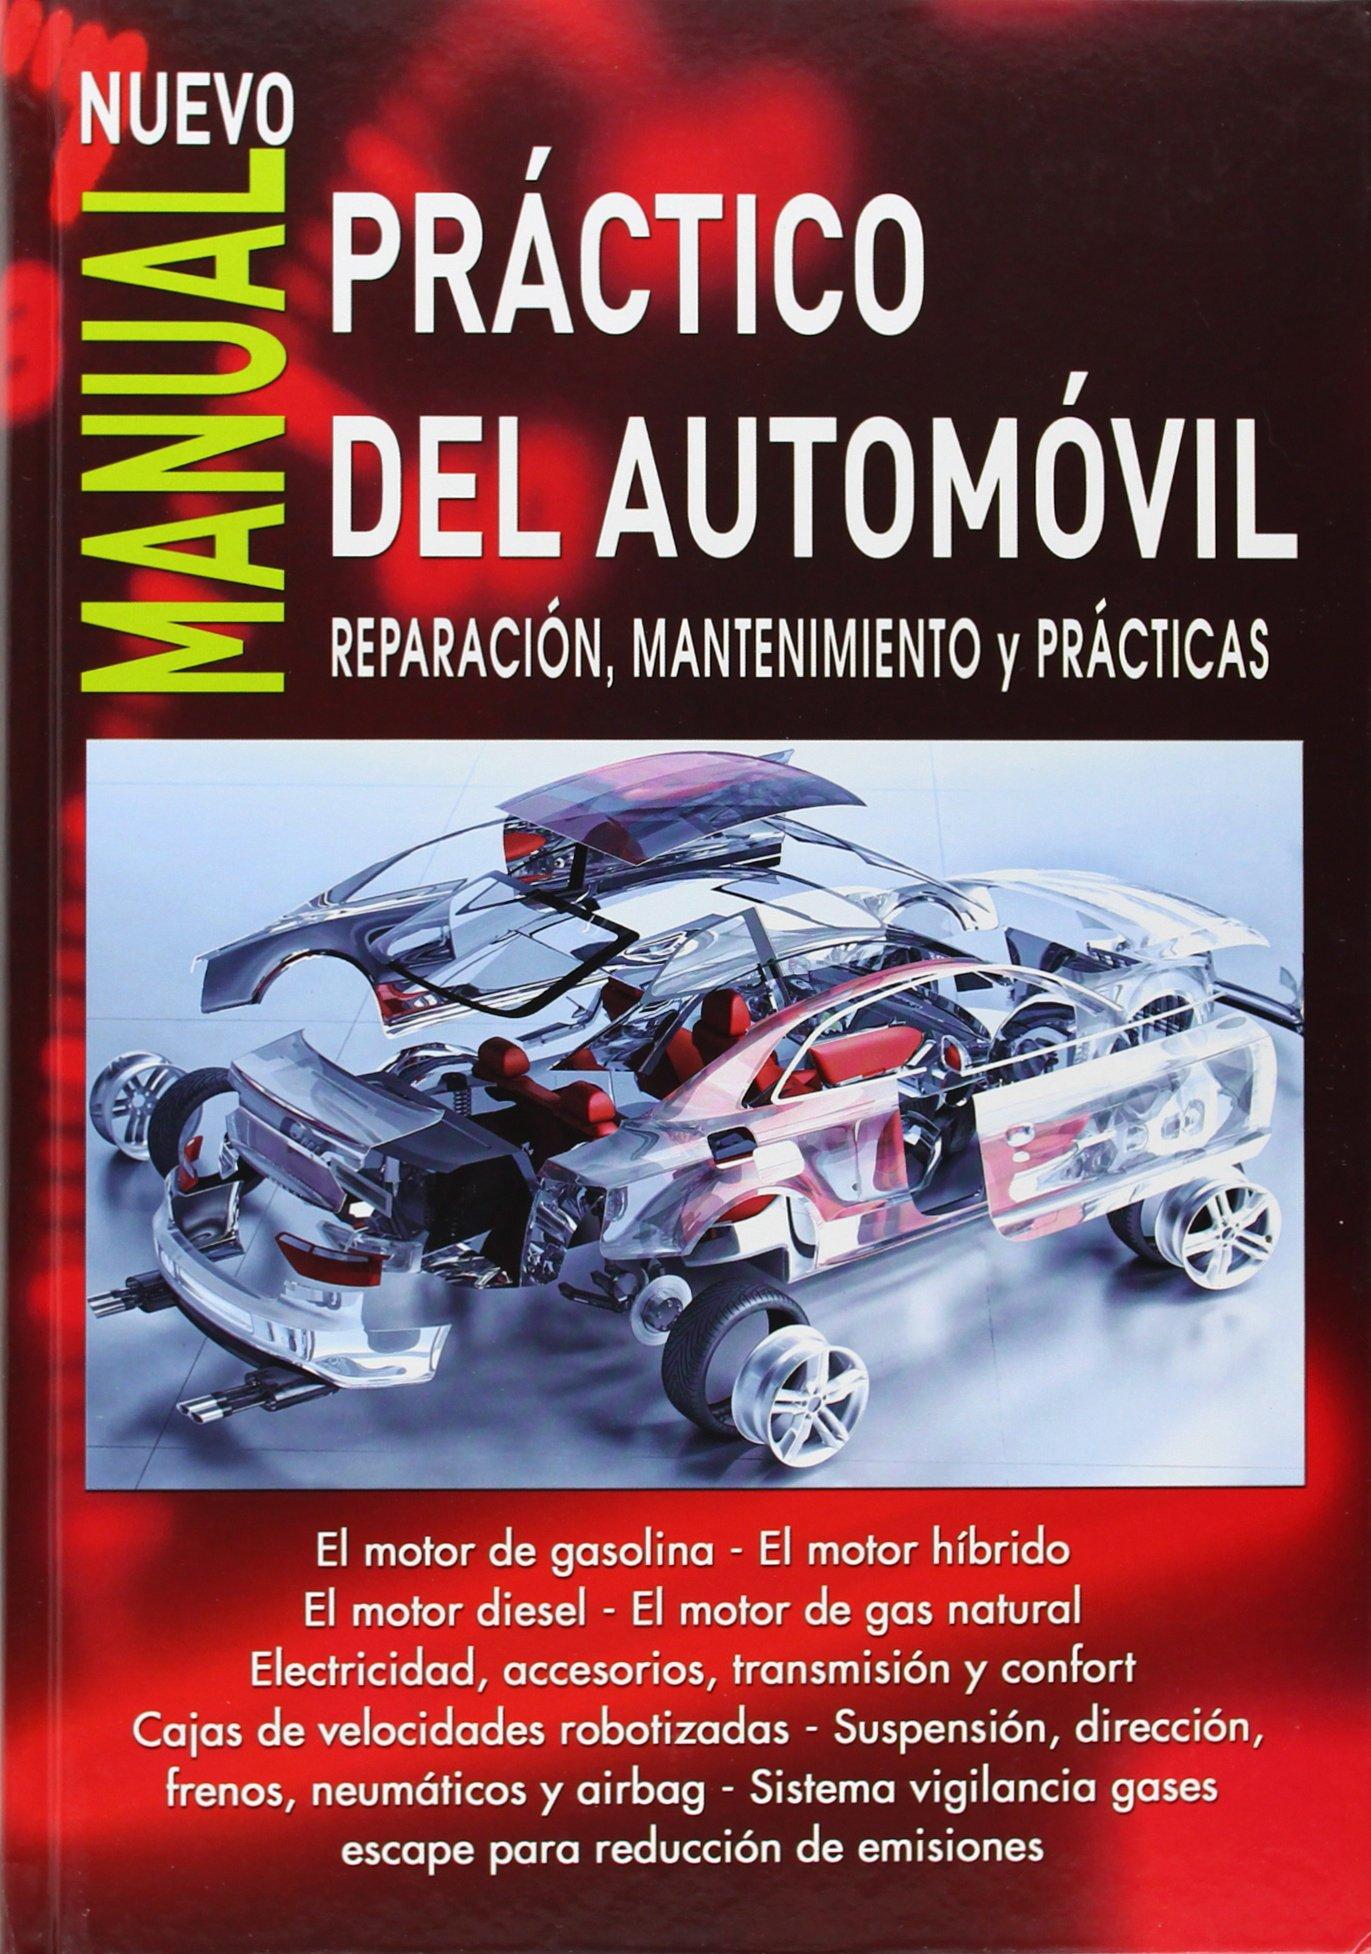 MANUAL PRACTICO DEL AUTOMOVIL (5ª EDICION) (Spanish) Paperback – 2013